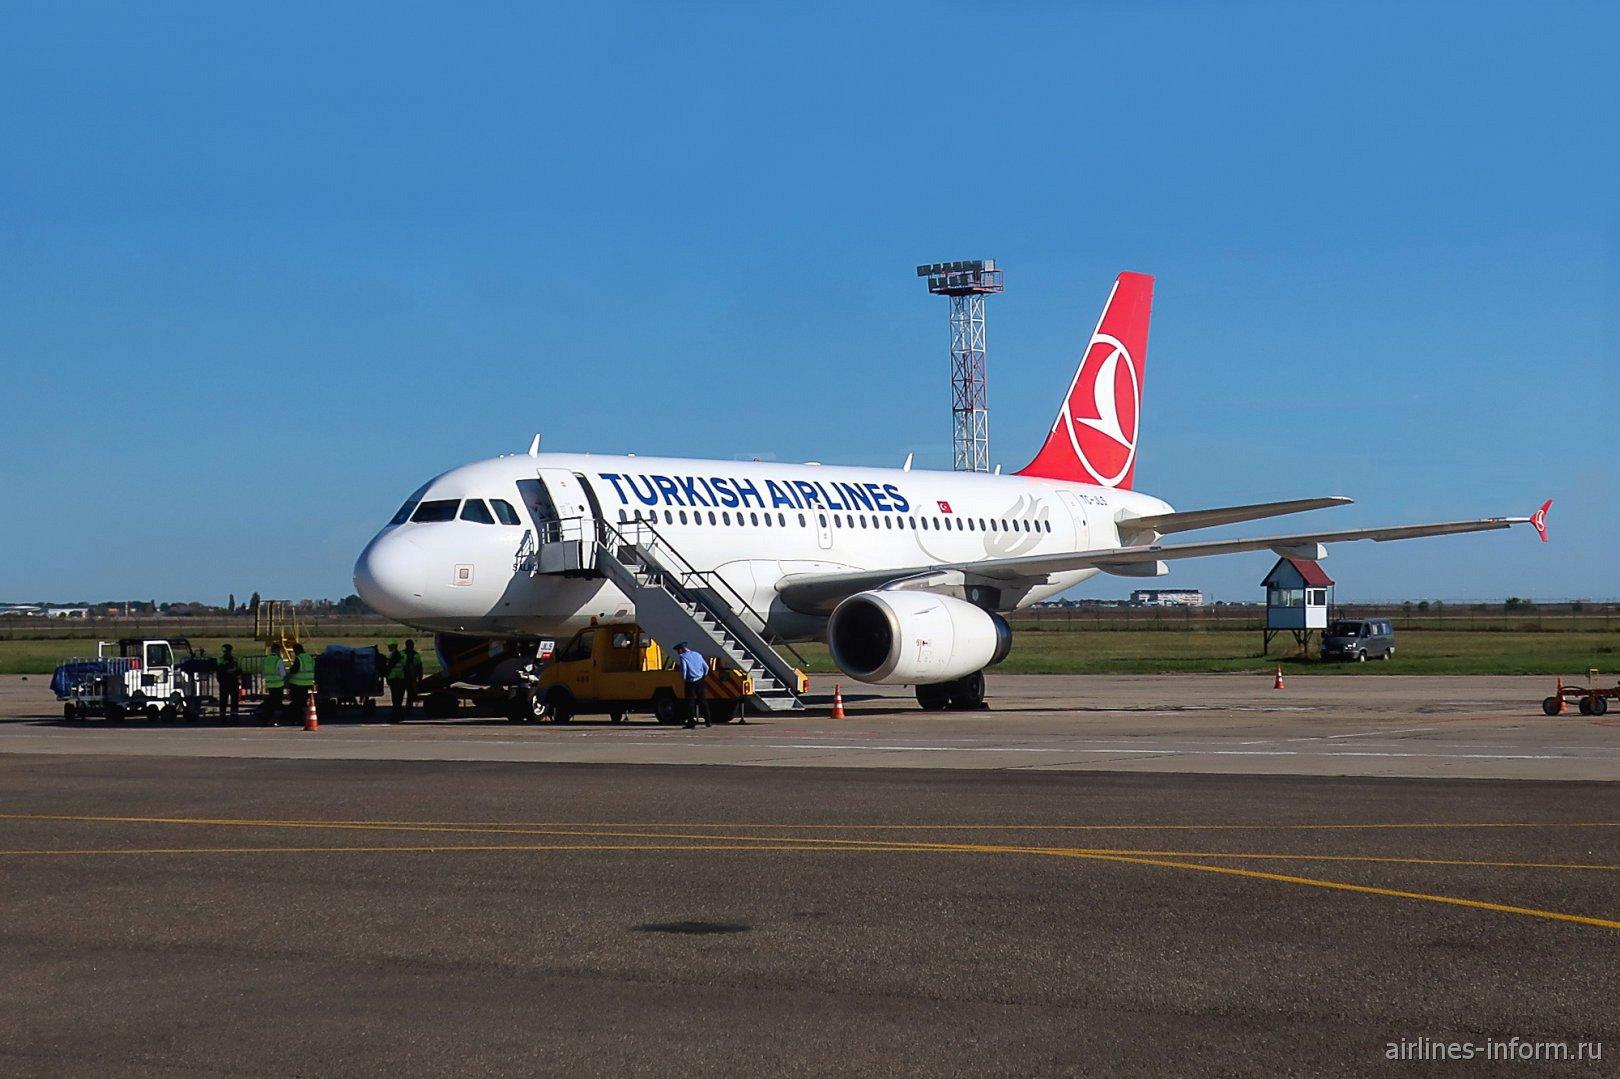 Самолет Airbus A319 Турецких авиалиний в аэропорту Краснодара